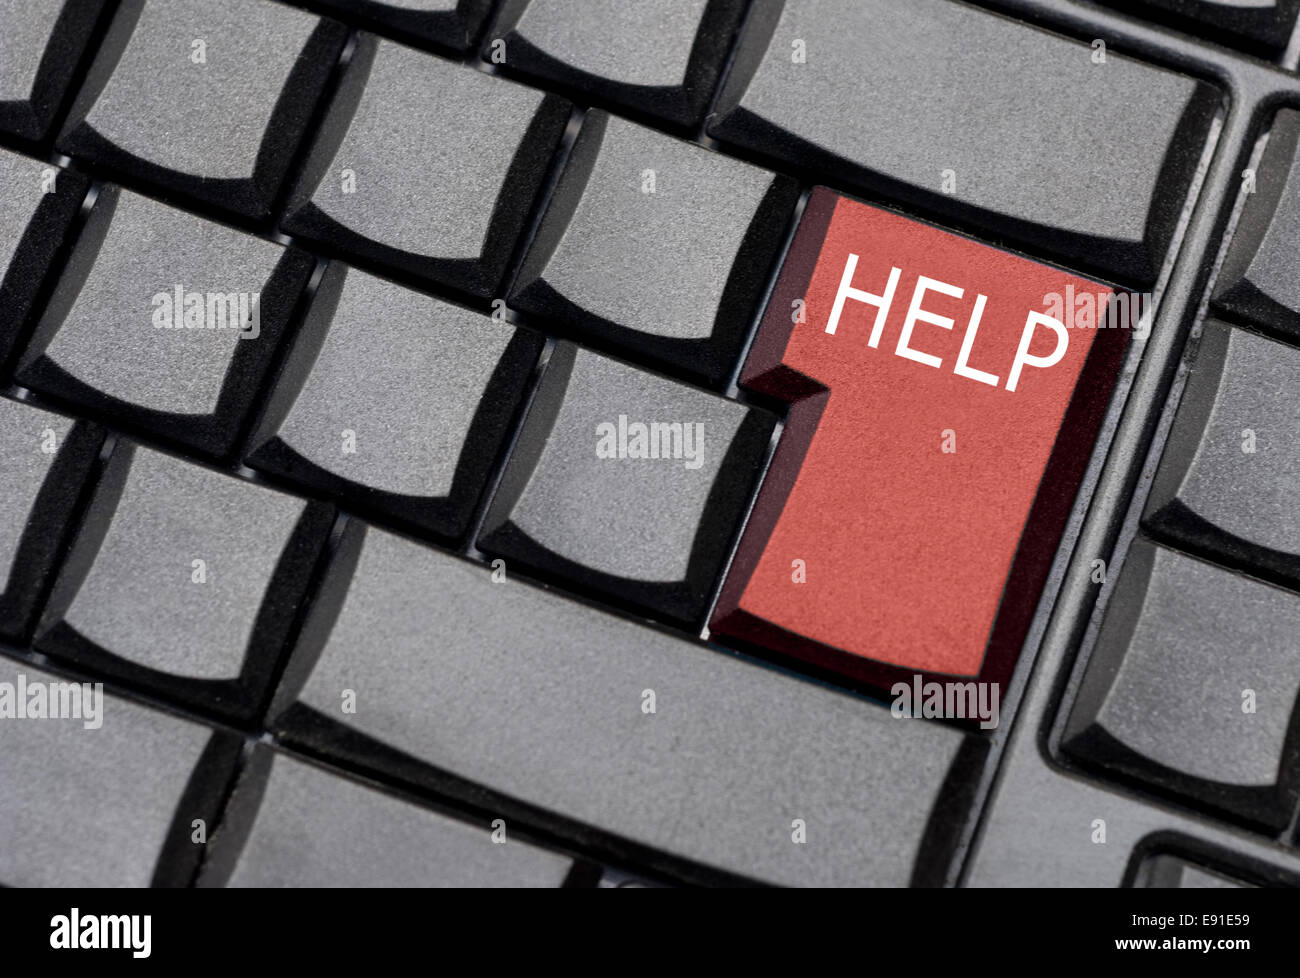 help computer key - Stock Image